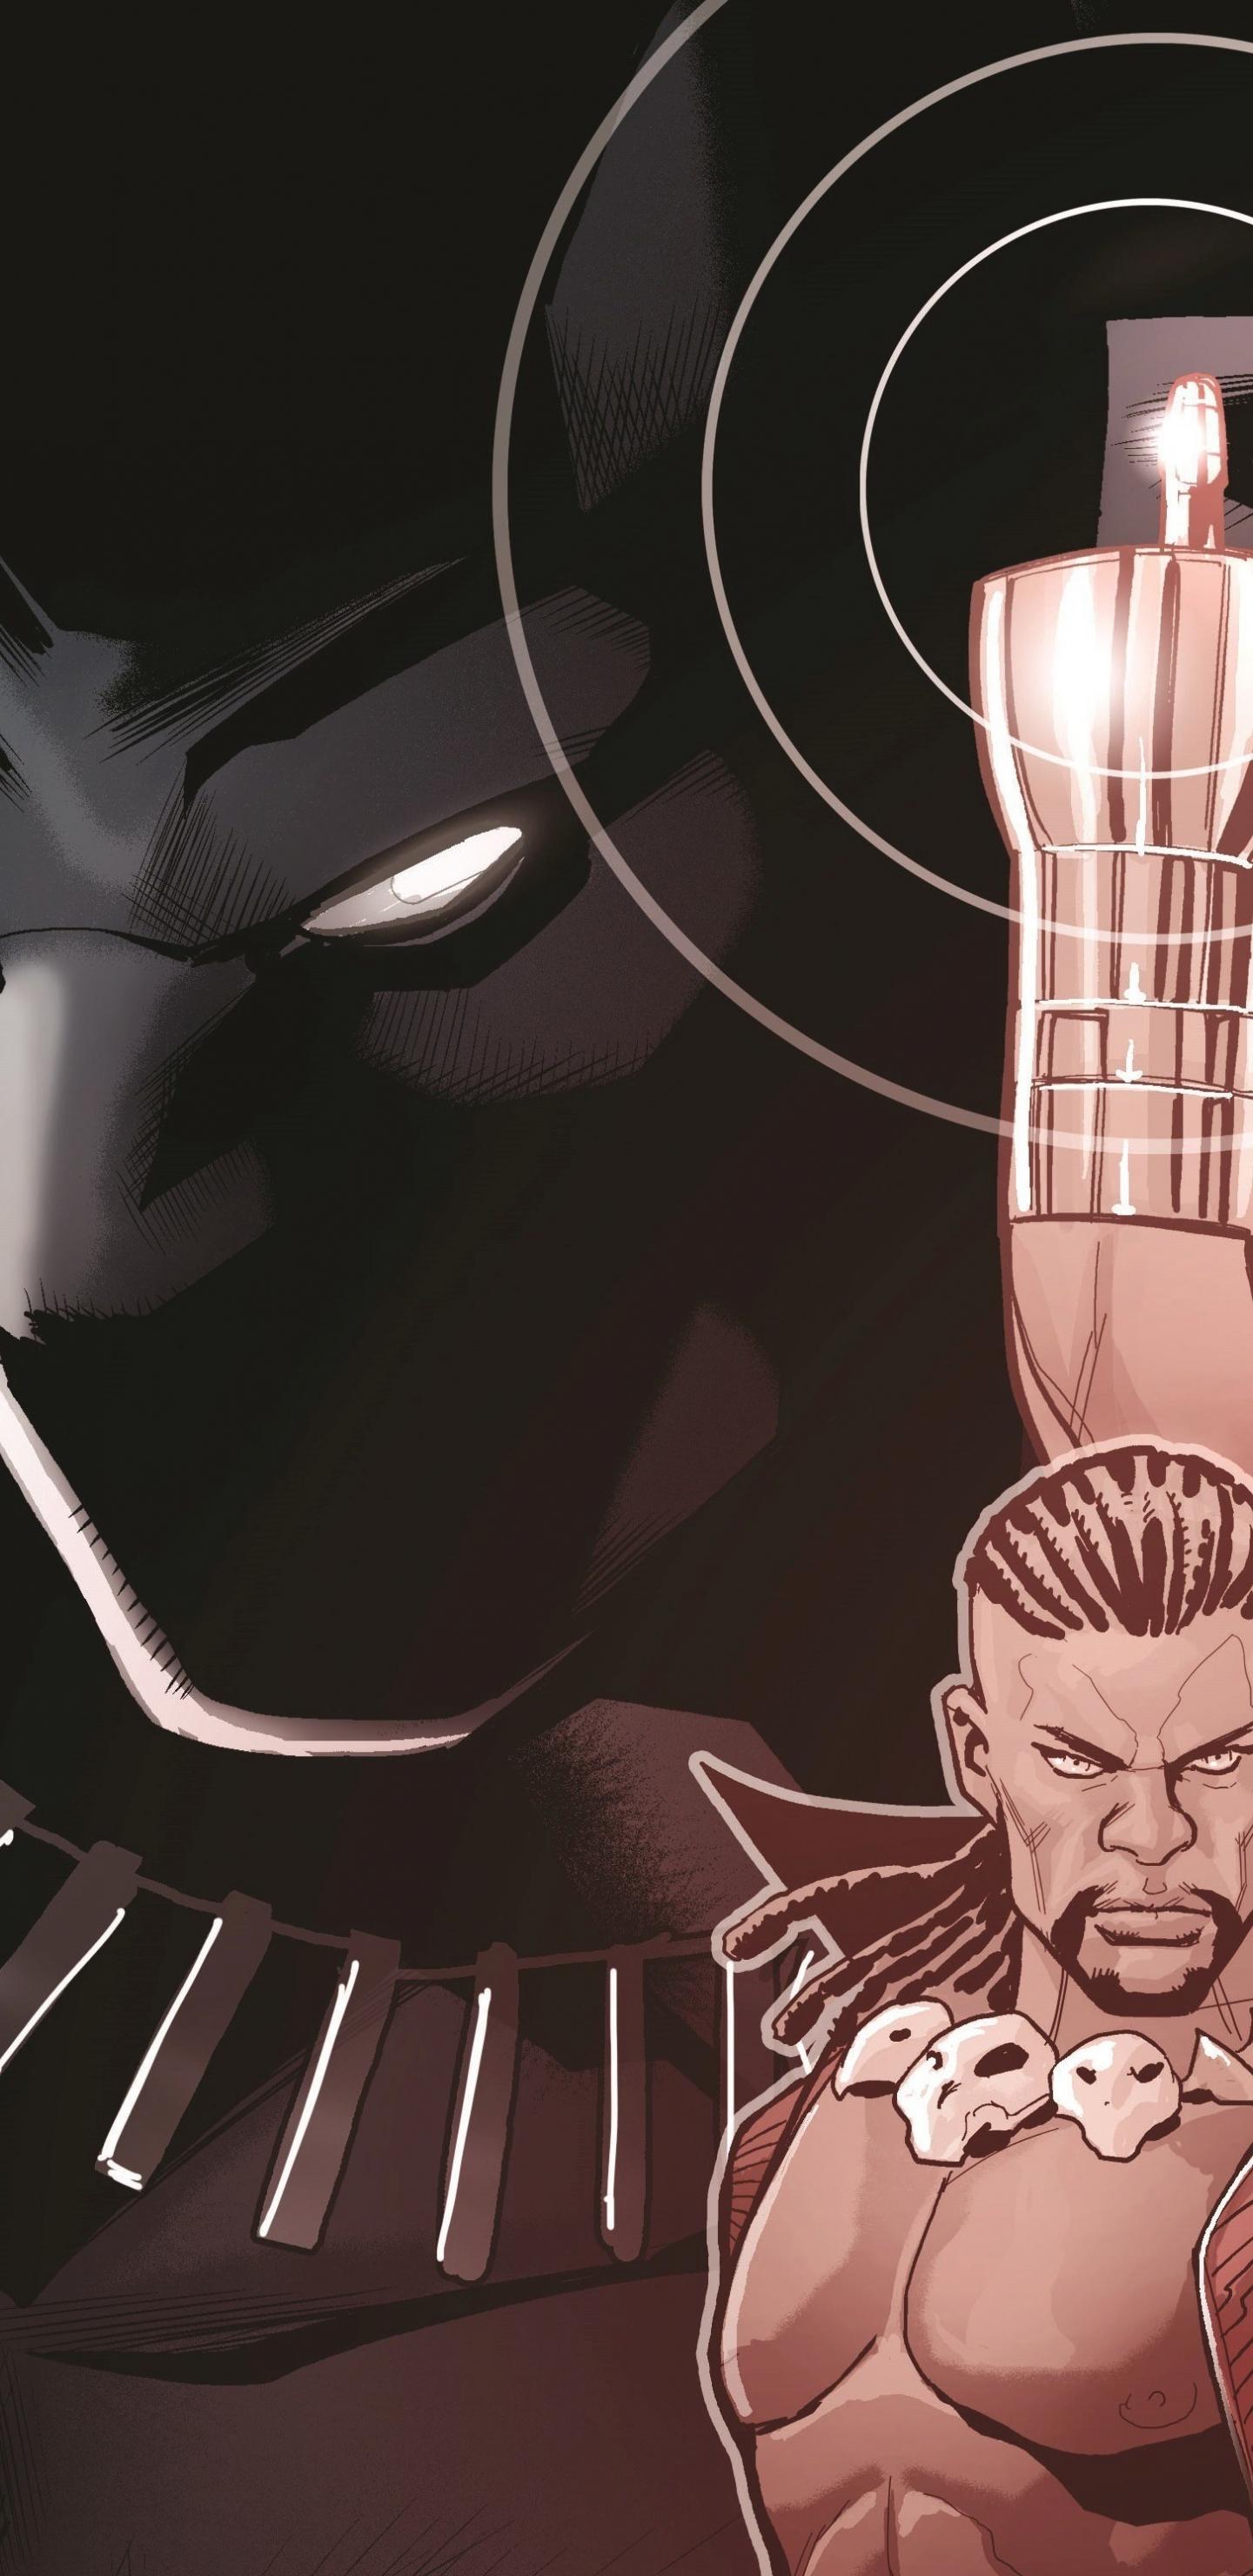 Black panther, superhero, comics, 1440x2960 wallpaper